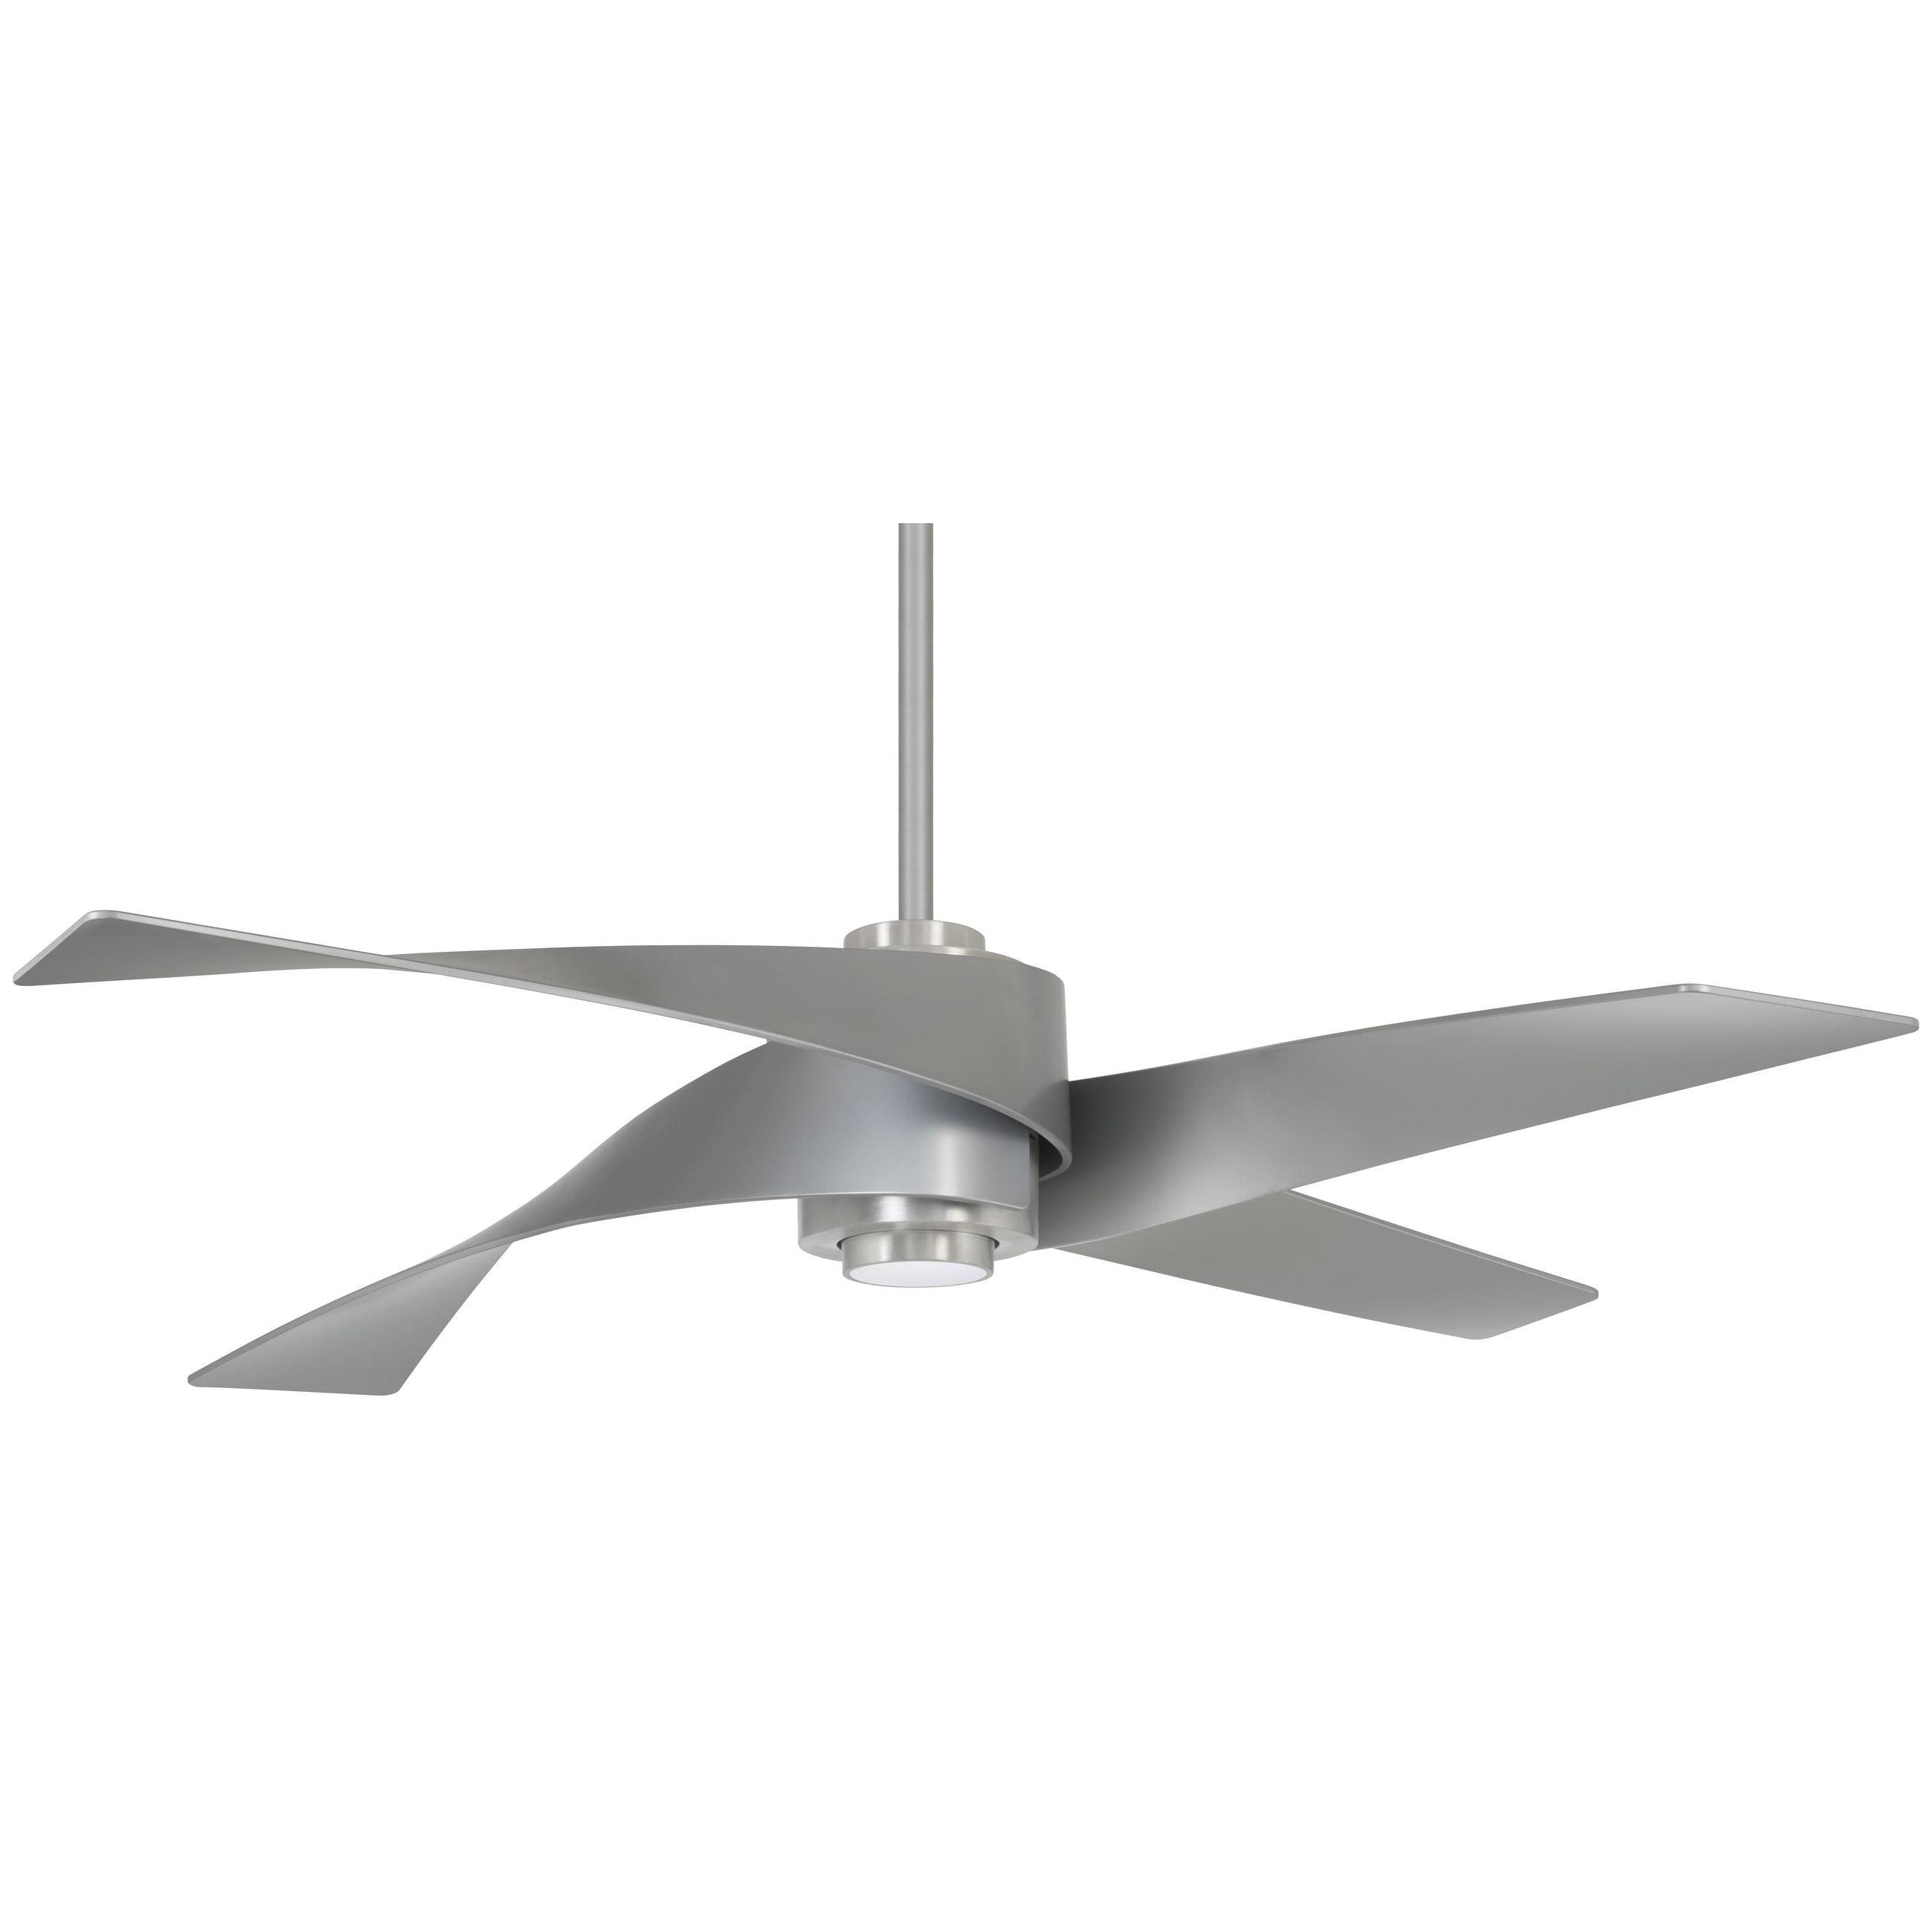 Artemis Iv 64 Inch Led Ceiling Fan In Brushed Nickel W Silver Finish Blades N A